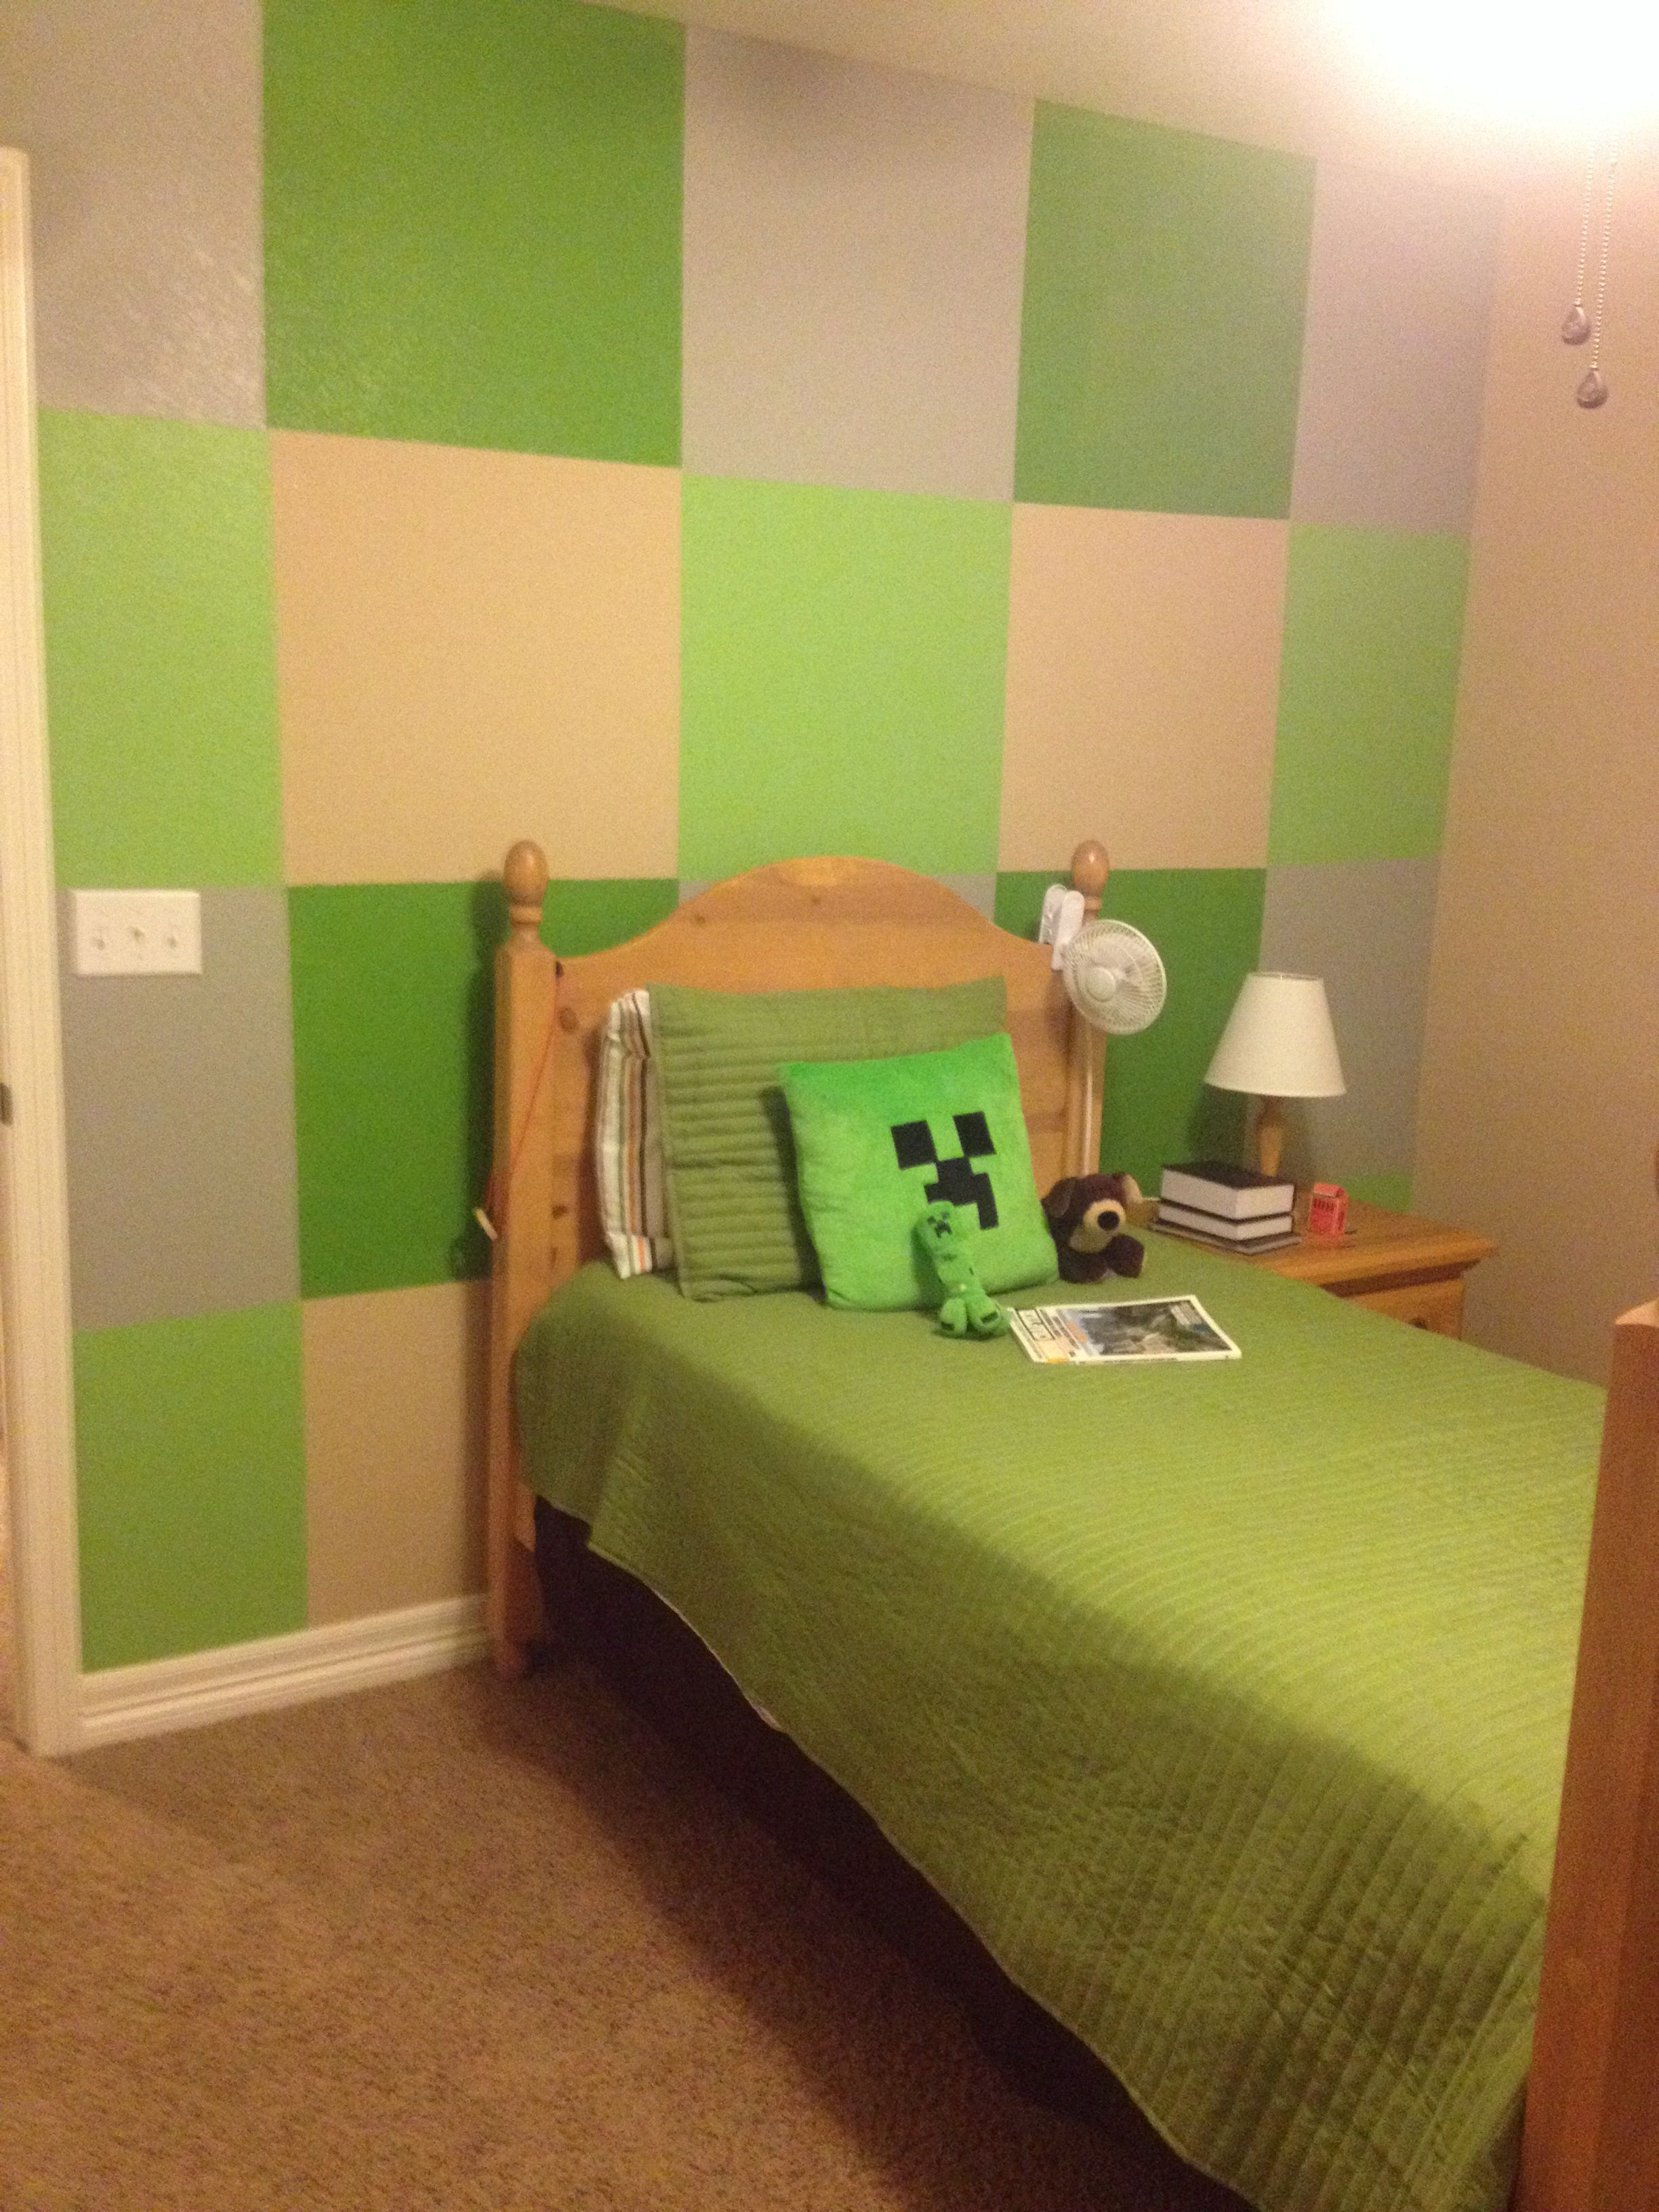 Pin By Becky Webb Pedersen On For The Home Minecraft Bedroom Decor Bedroom Ideas Pinterest Boys Bedrooms